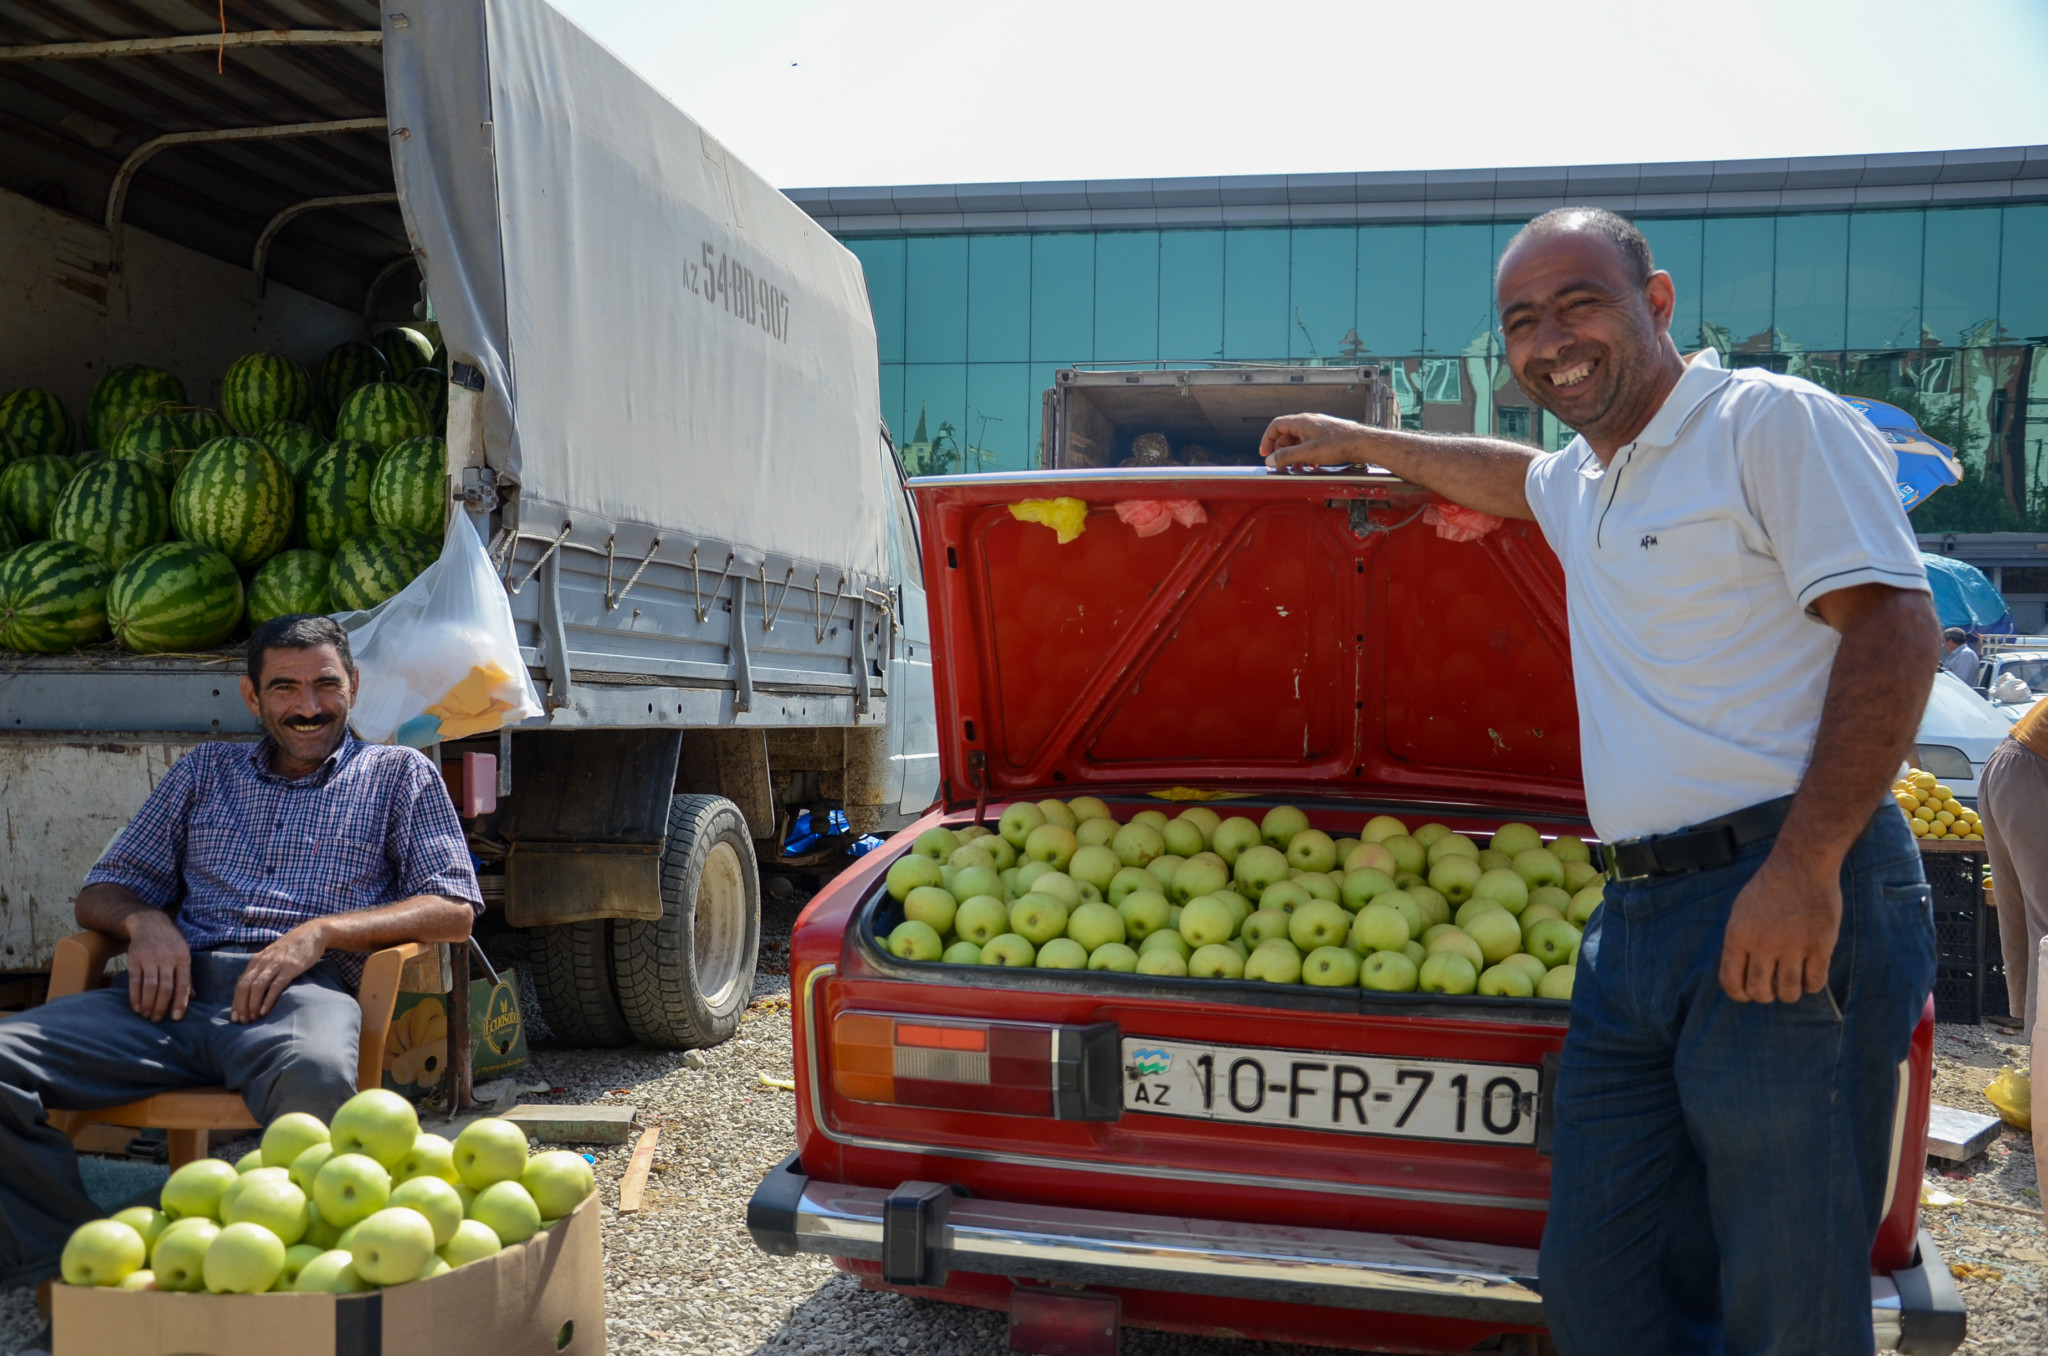 Äpfel sind ein großes Exportgut